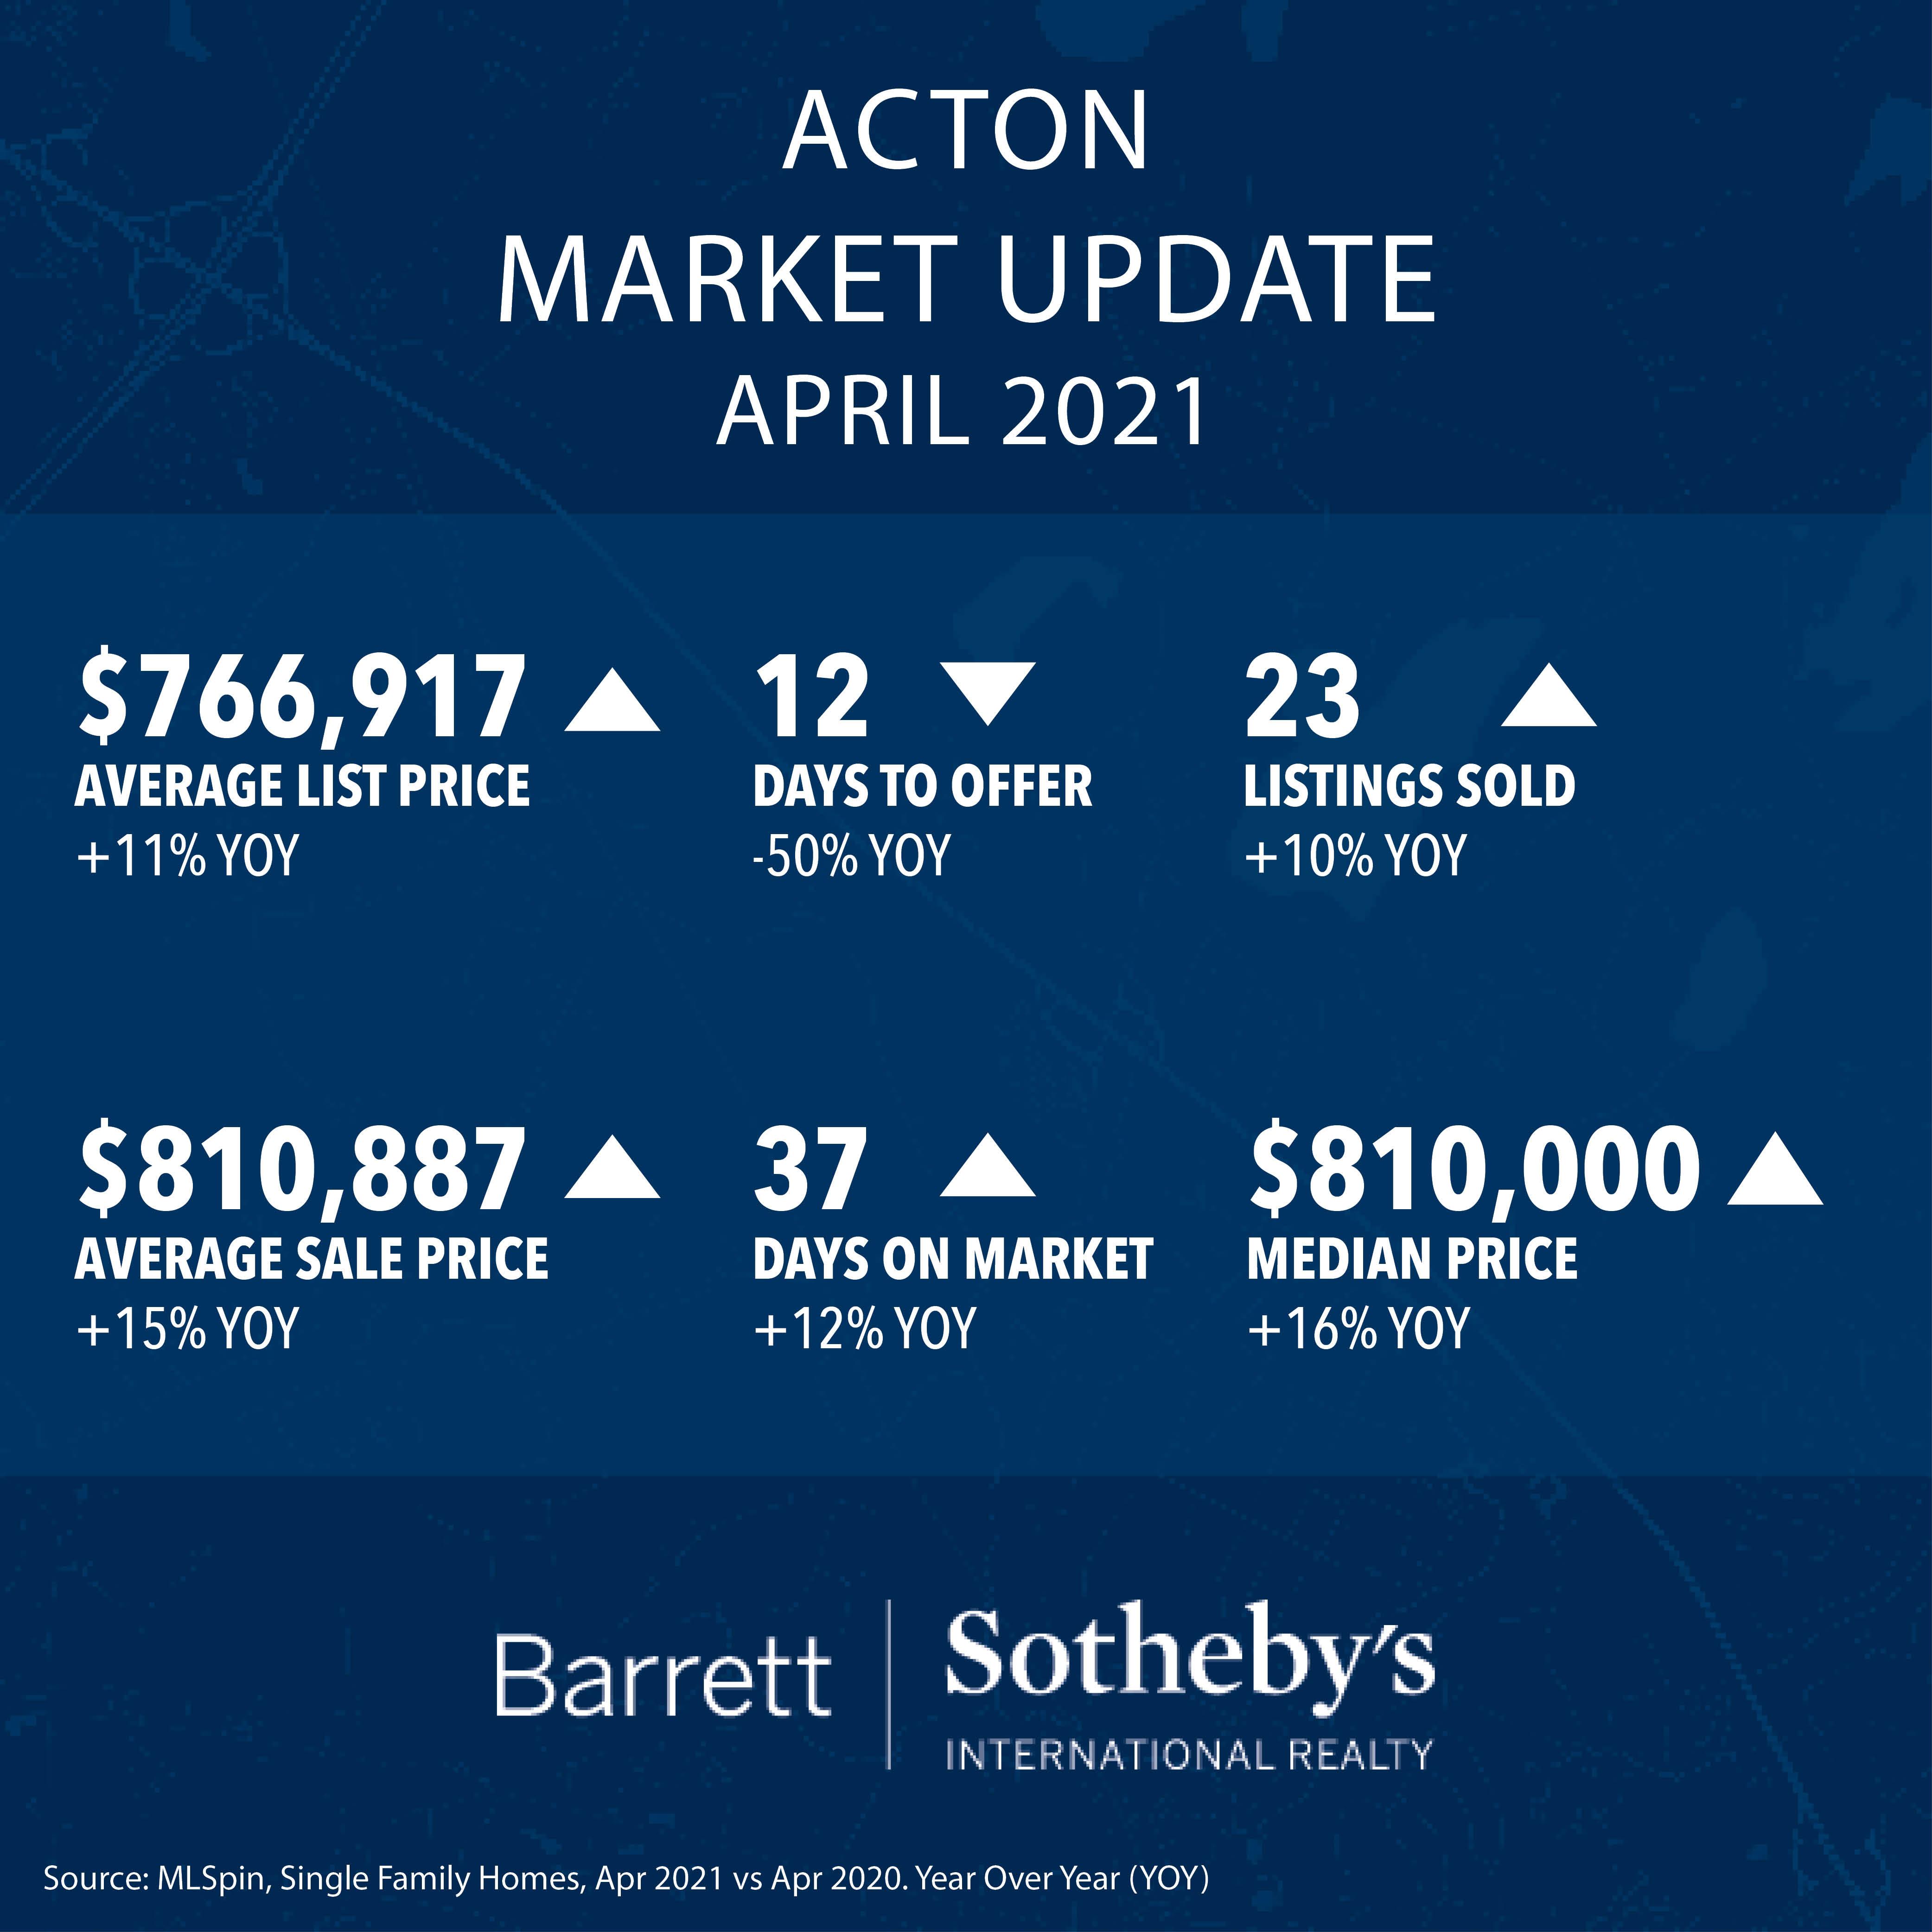 Acton Real Estate Market Update